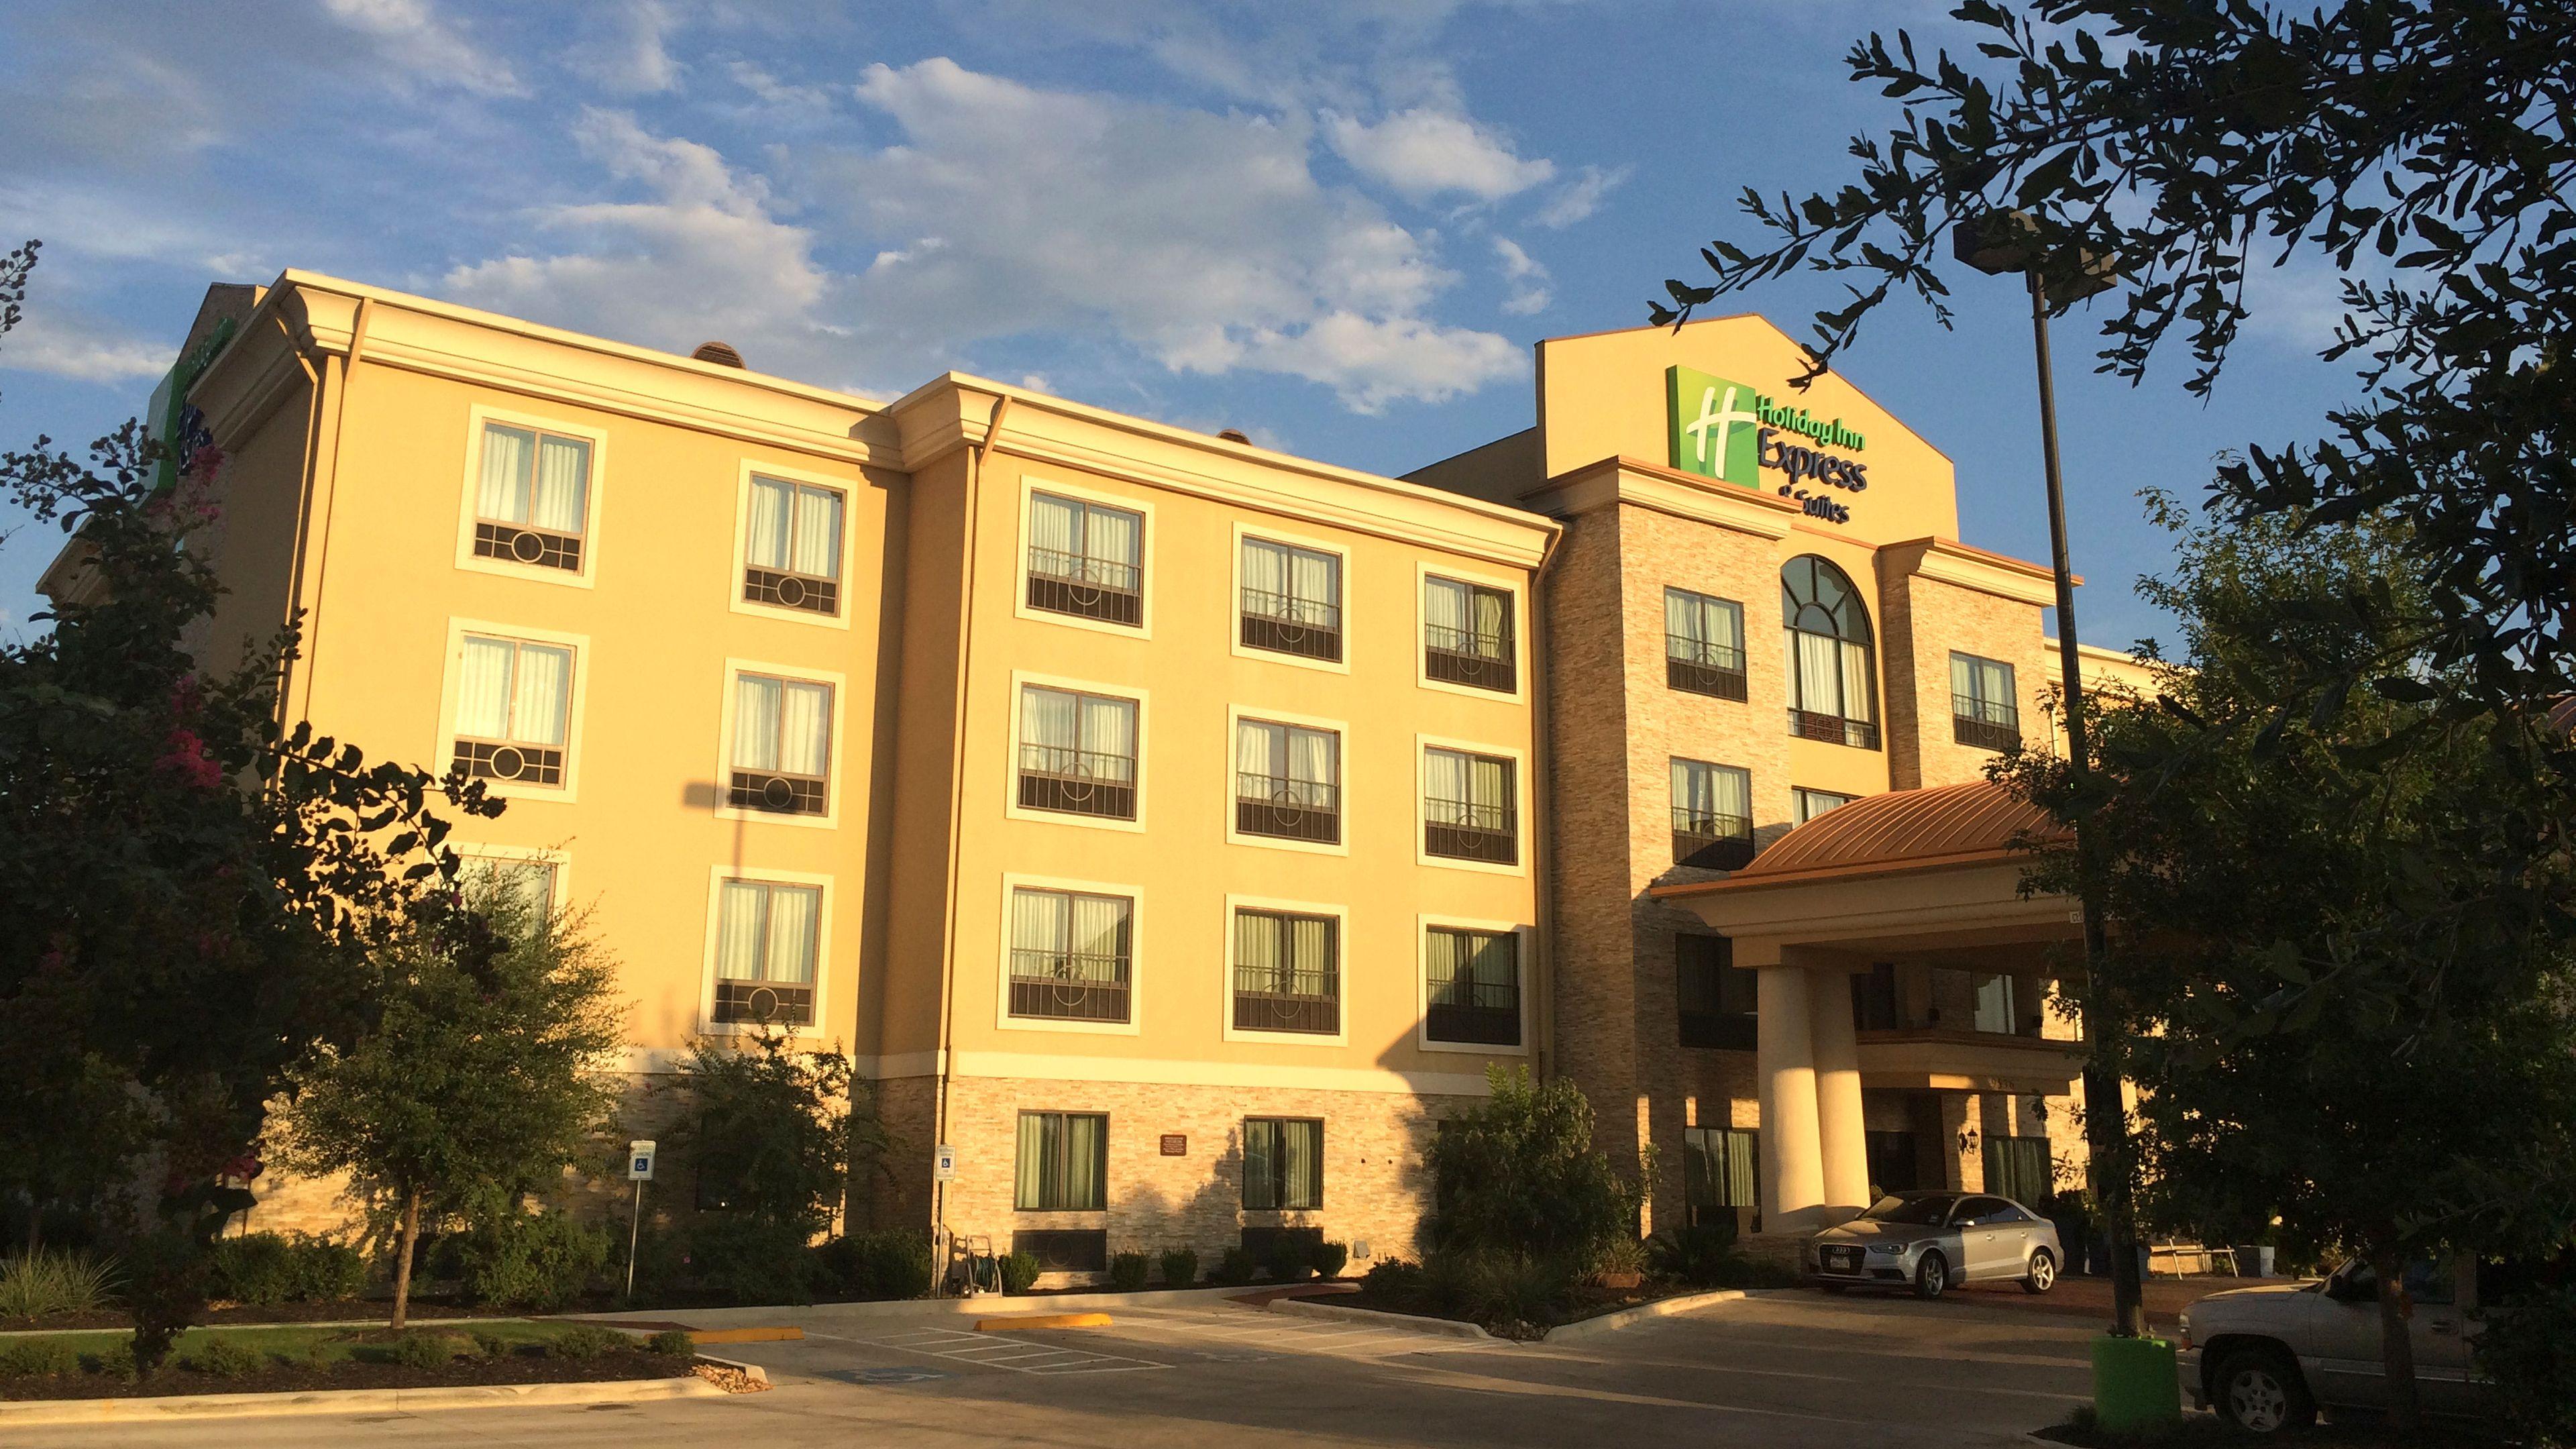 Holiday Inn Express Amp Suites San Antonio Medical Ctr North